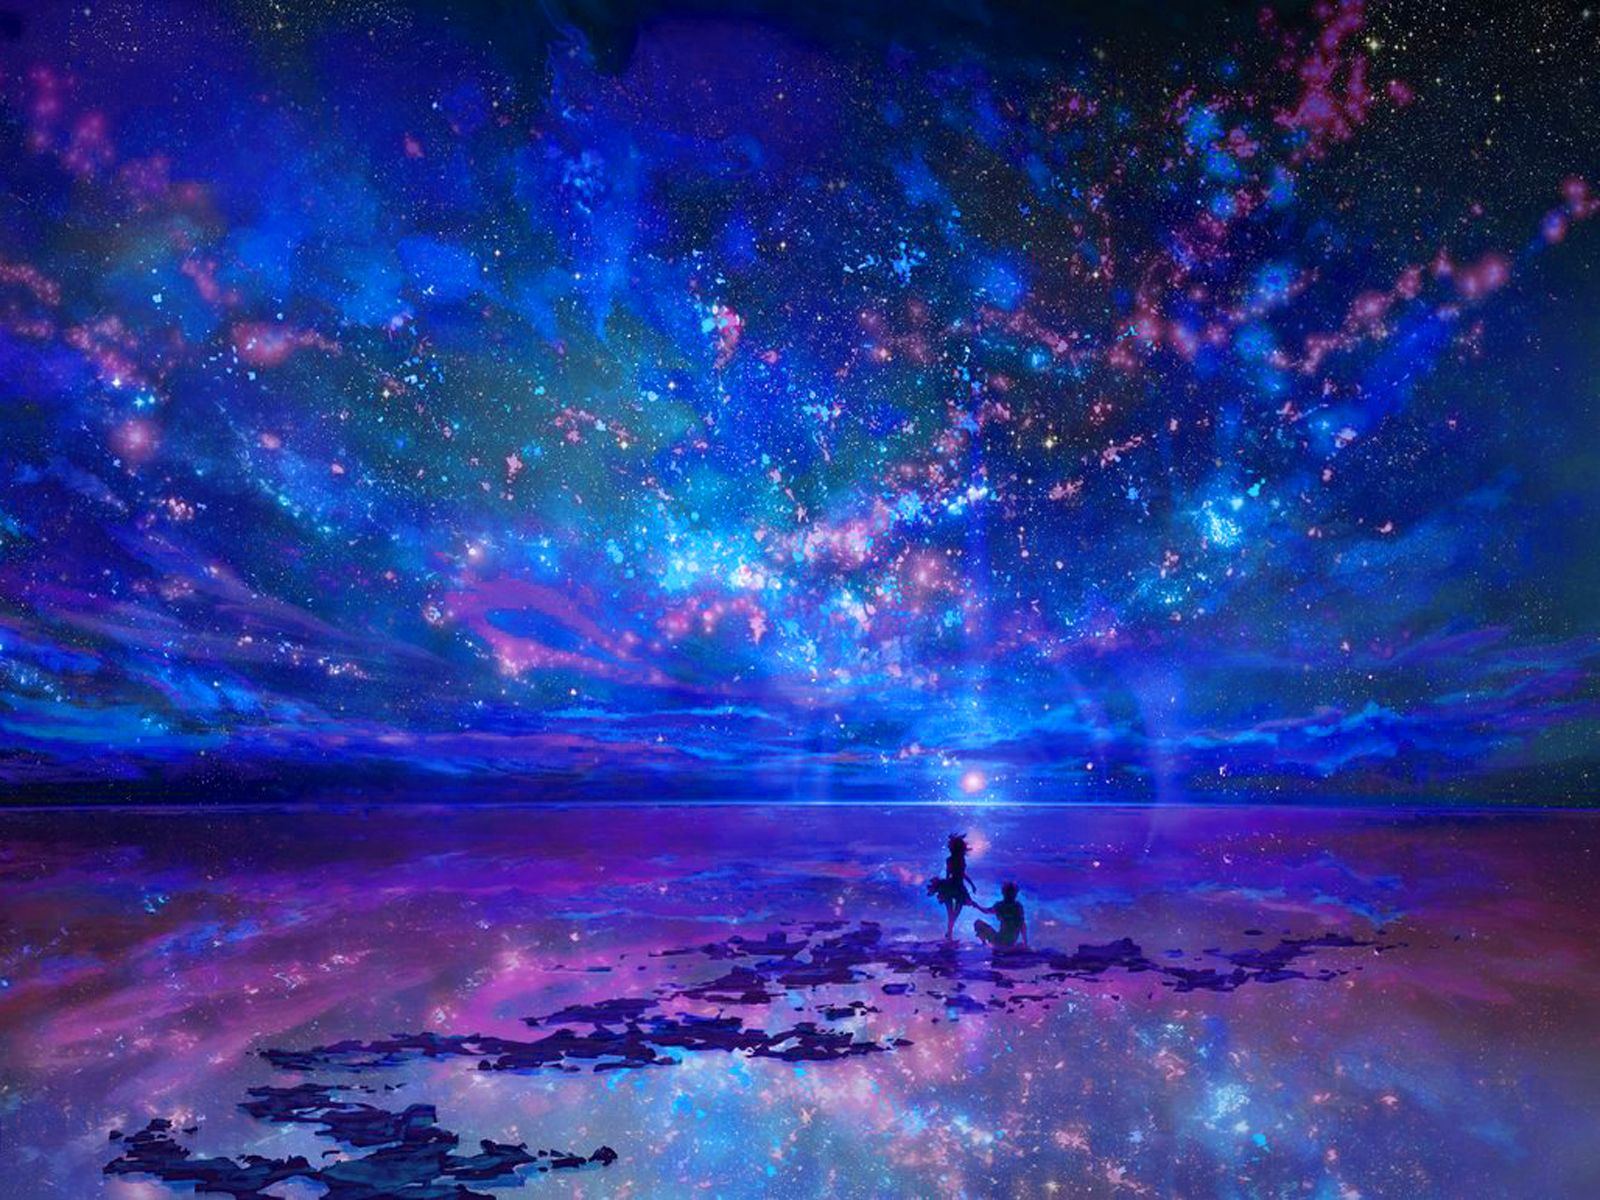 Bleu Edin. Fantasy land scapes | Fantasy Landscape Wallpaper/Background 1600 x 1200 - Id: 344676 ... B